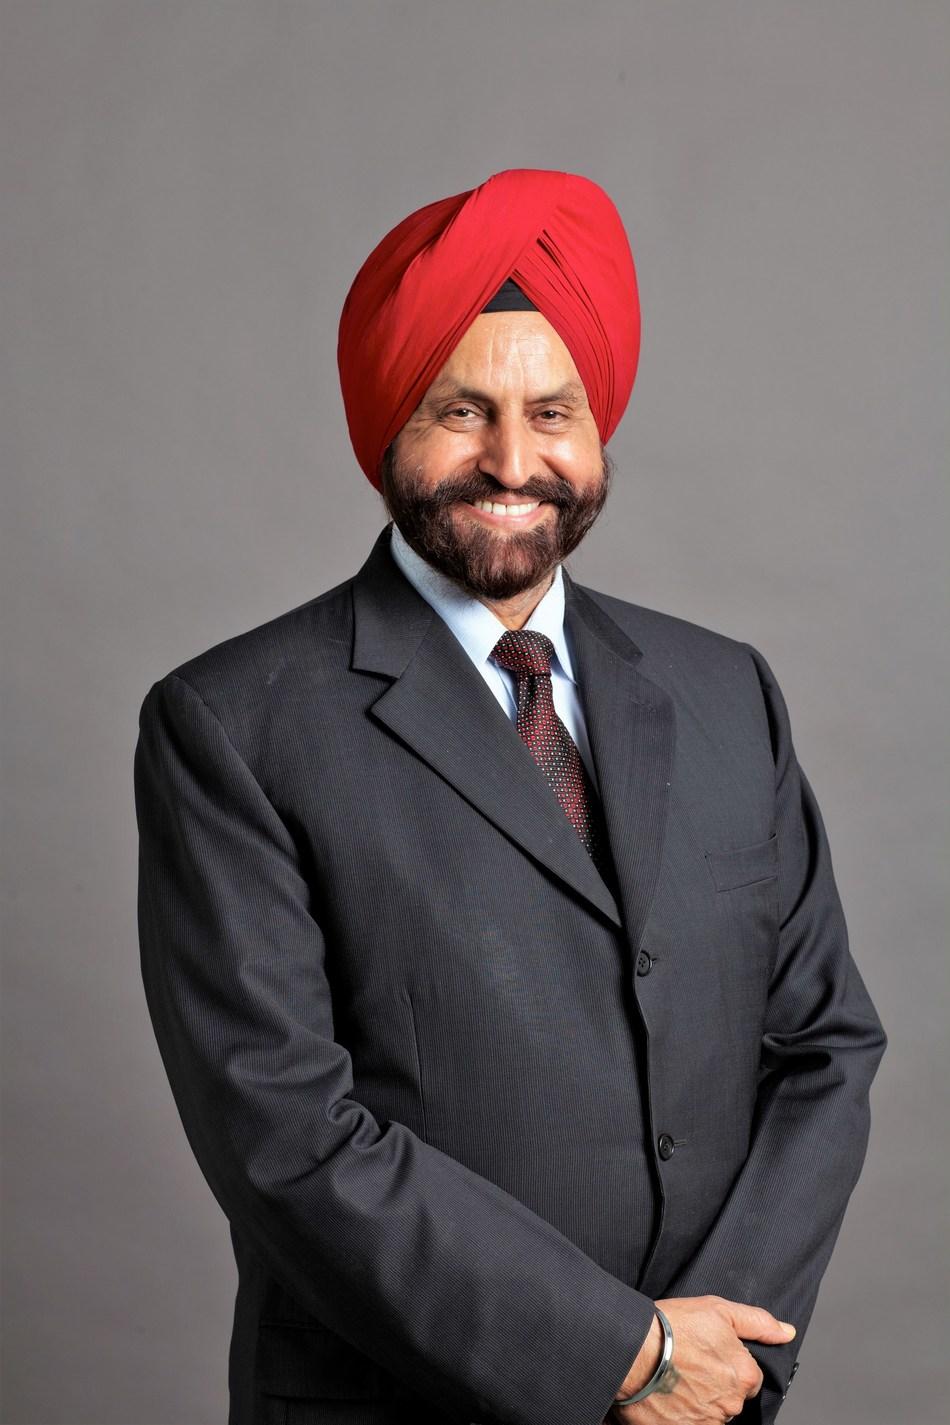 Sant Singh Chatwal, Presidente do Conselho da Dream Hotel Group (PRNewsfoto/Dream Hotel Group)